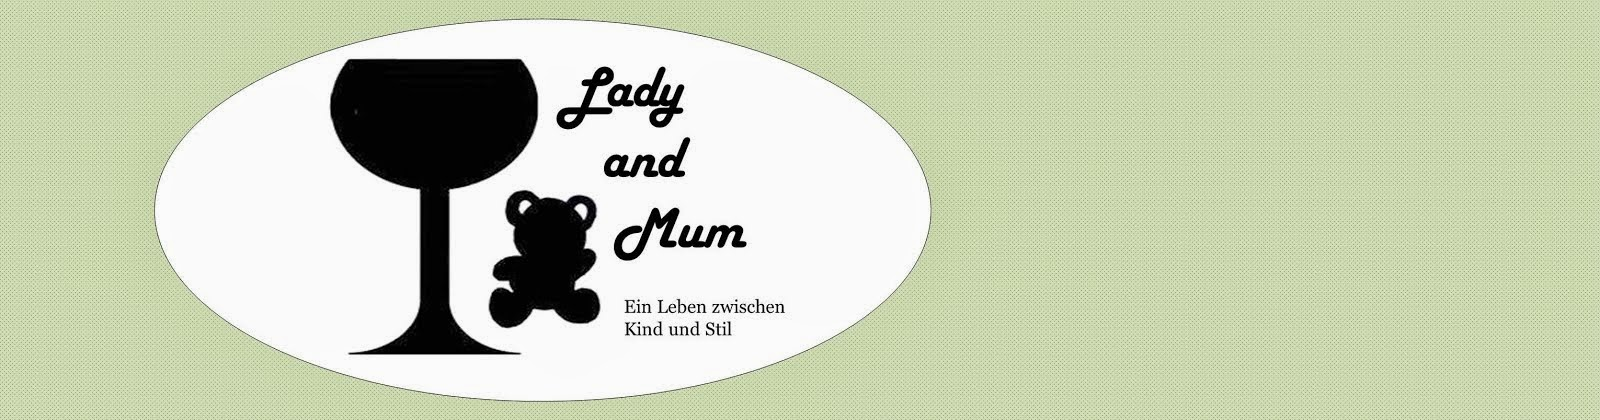 Lady and Mum